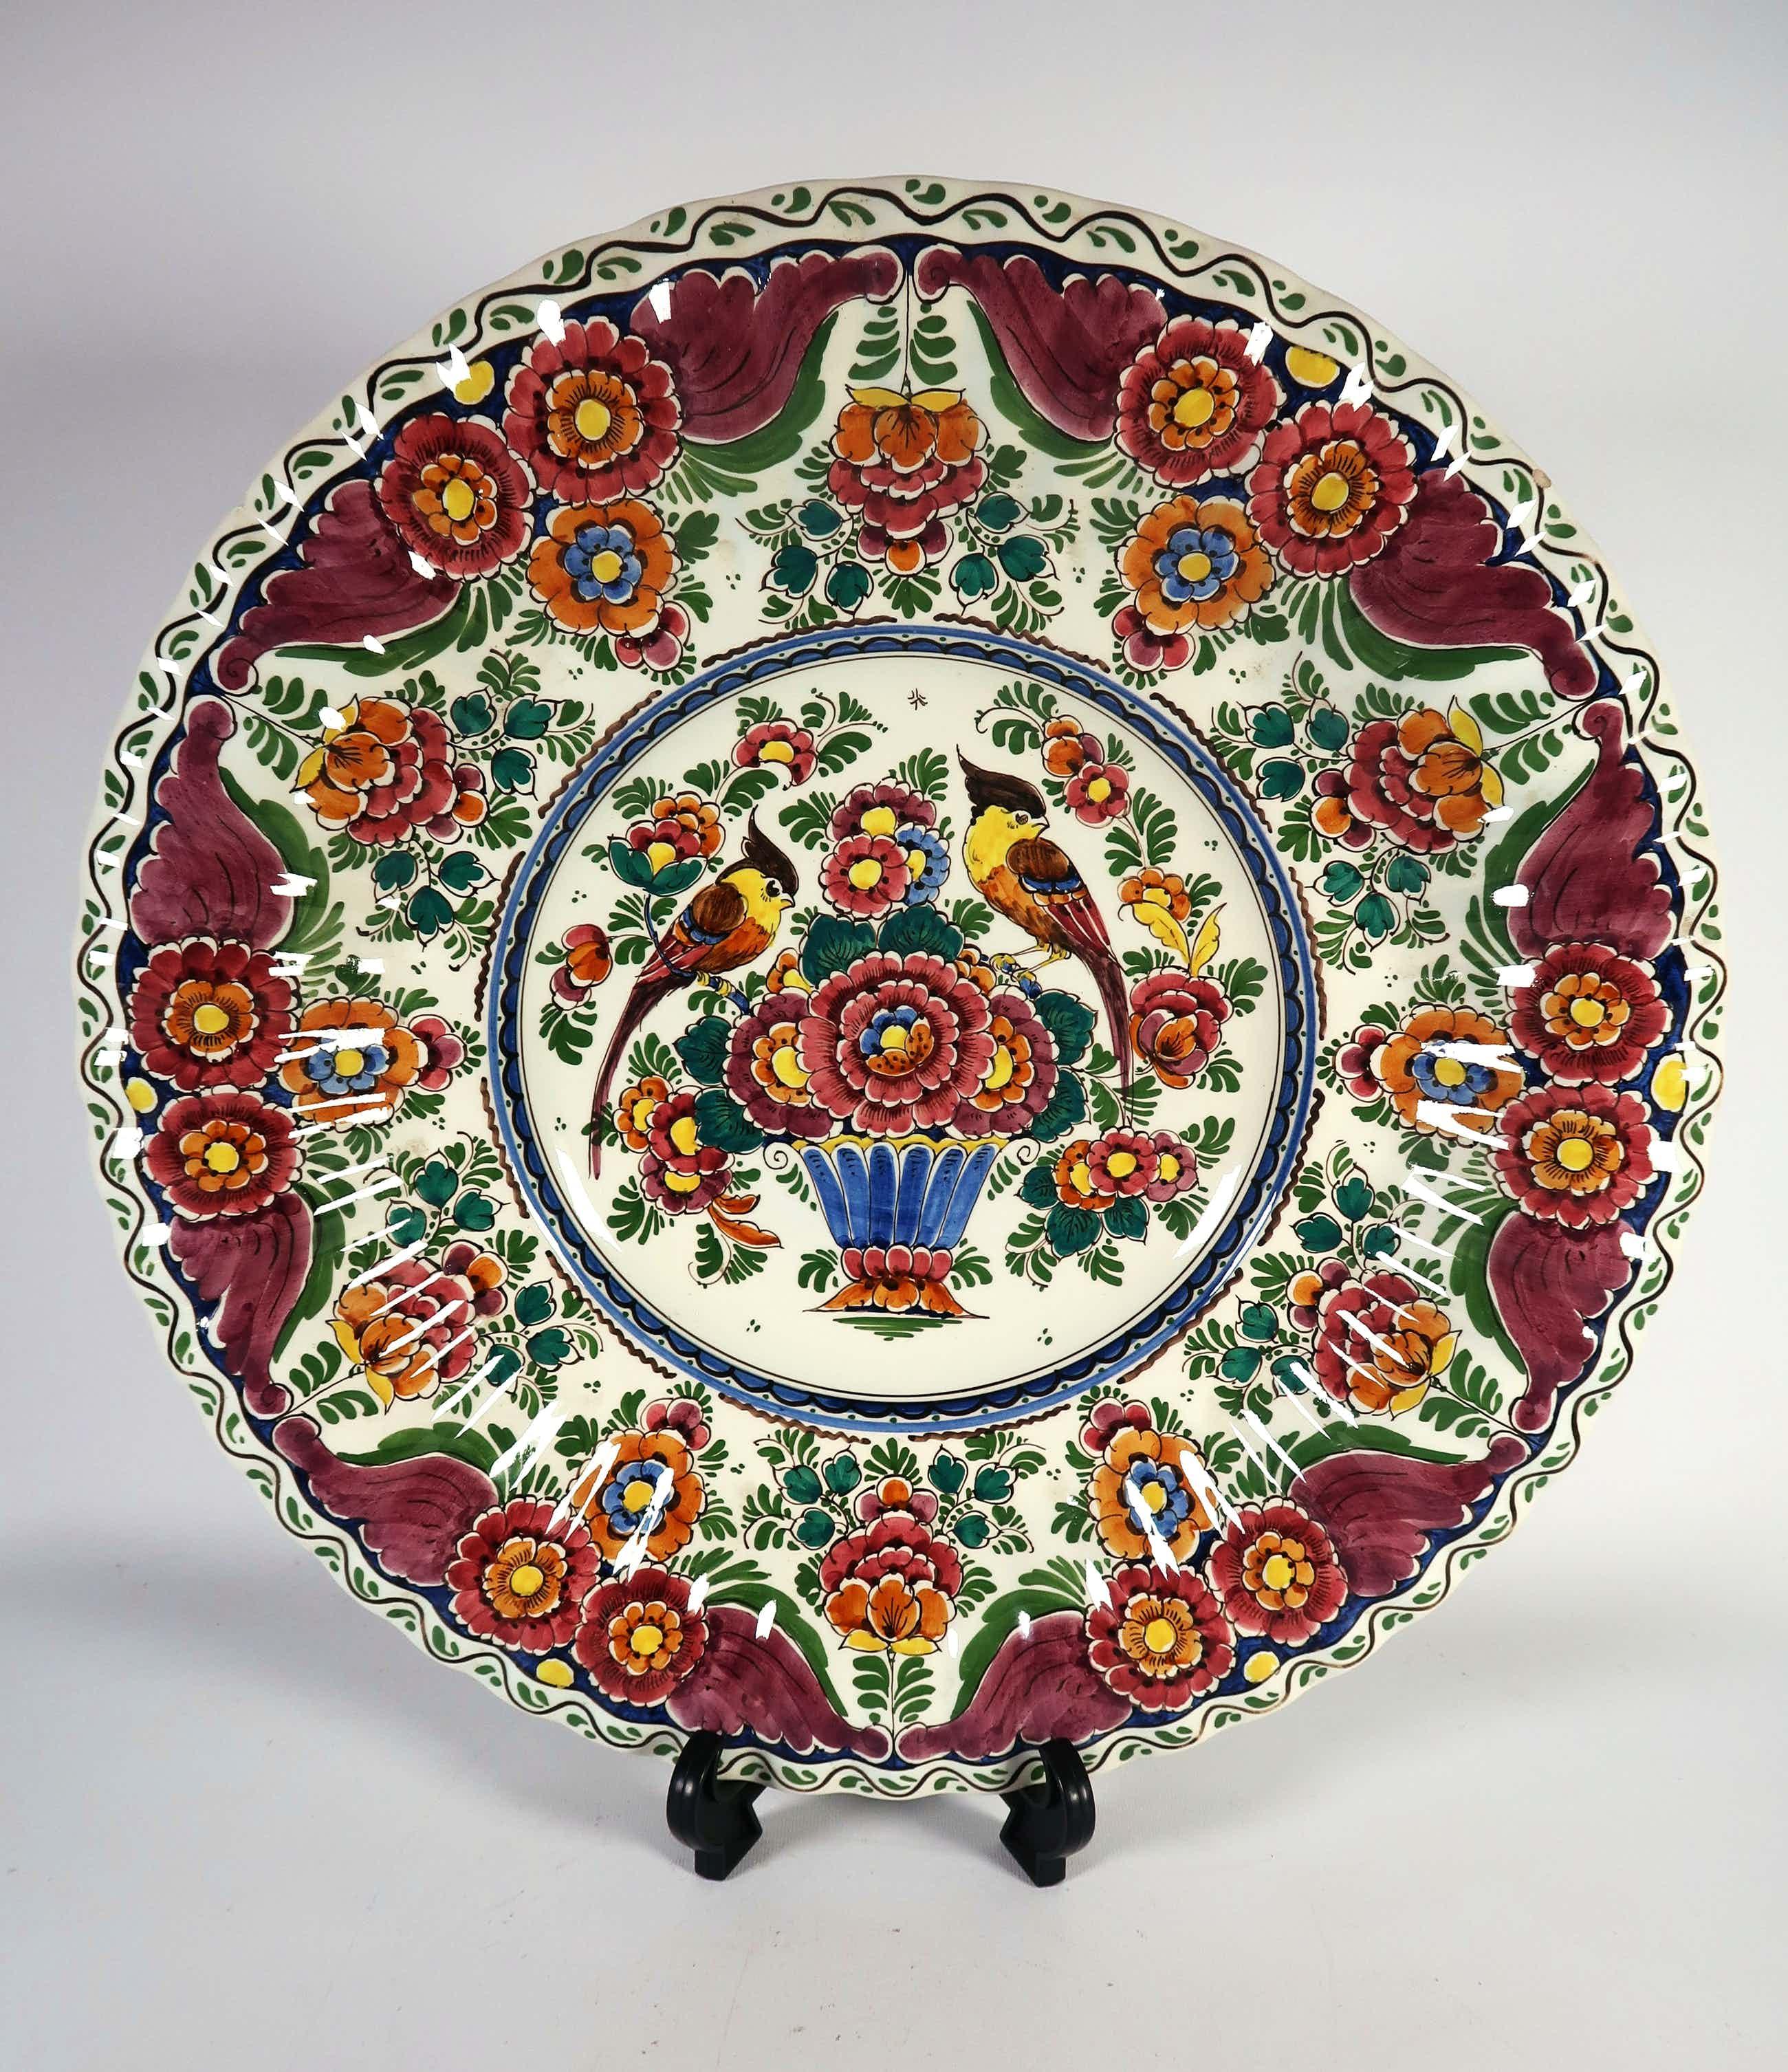 Keramiekfabriek Velsen - Aardewerk, Polychroom bord met bloemen en vogels (Groot) kopen? Bied vanaf 30!